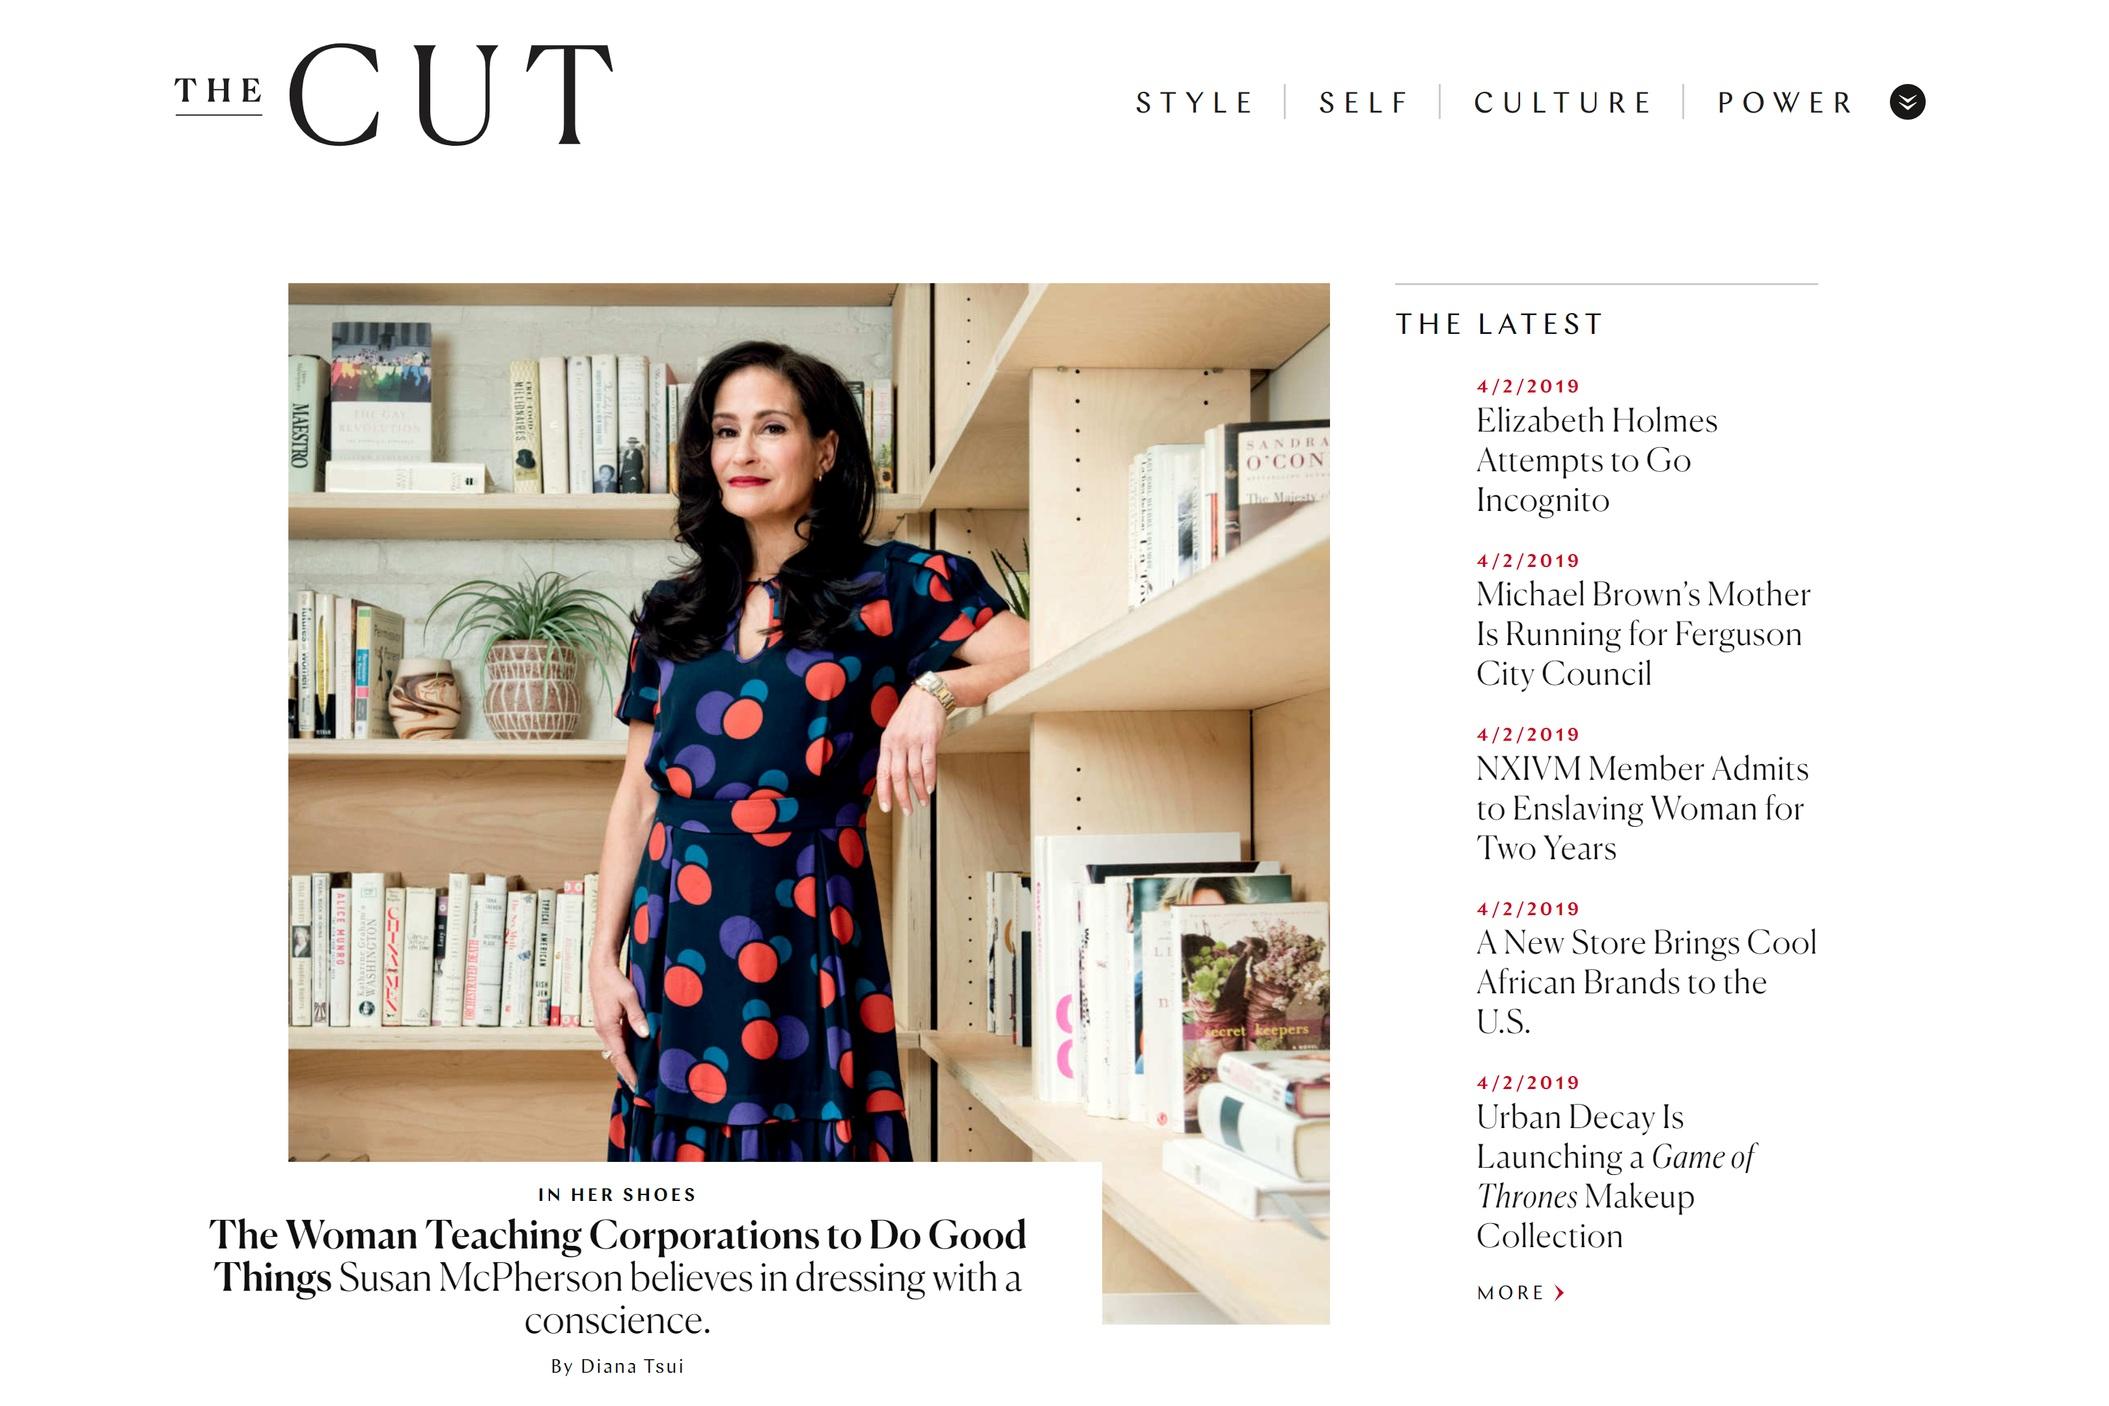 Best magazine for women - The Cut